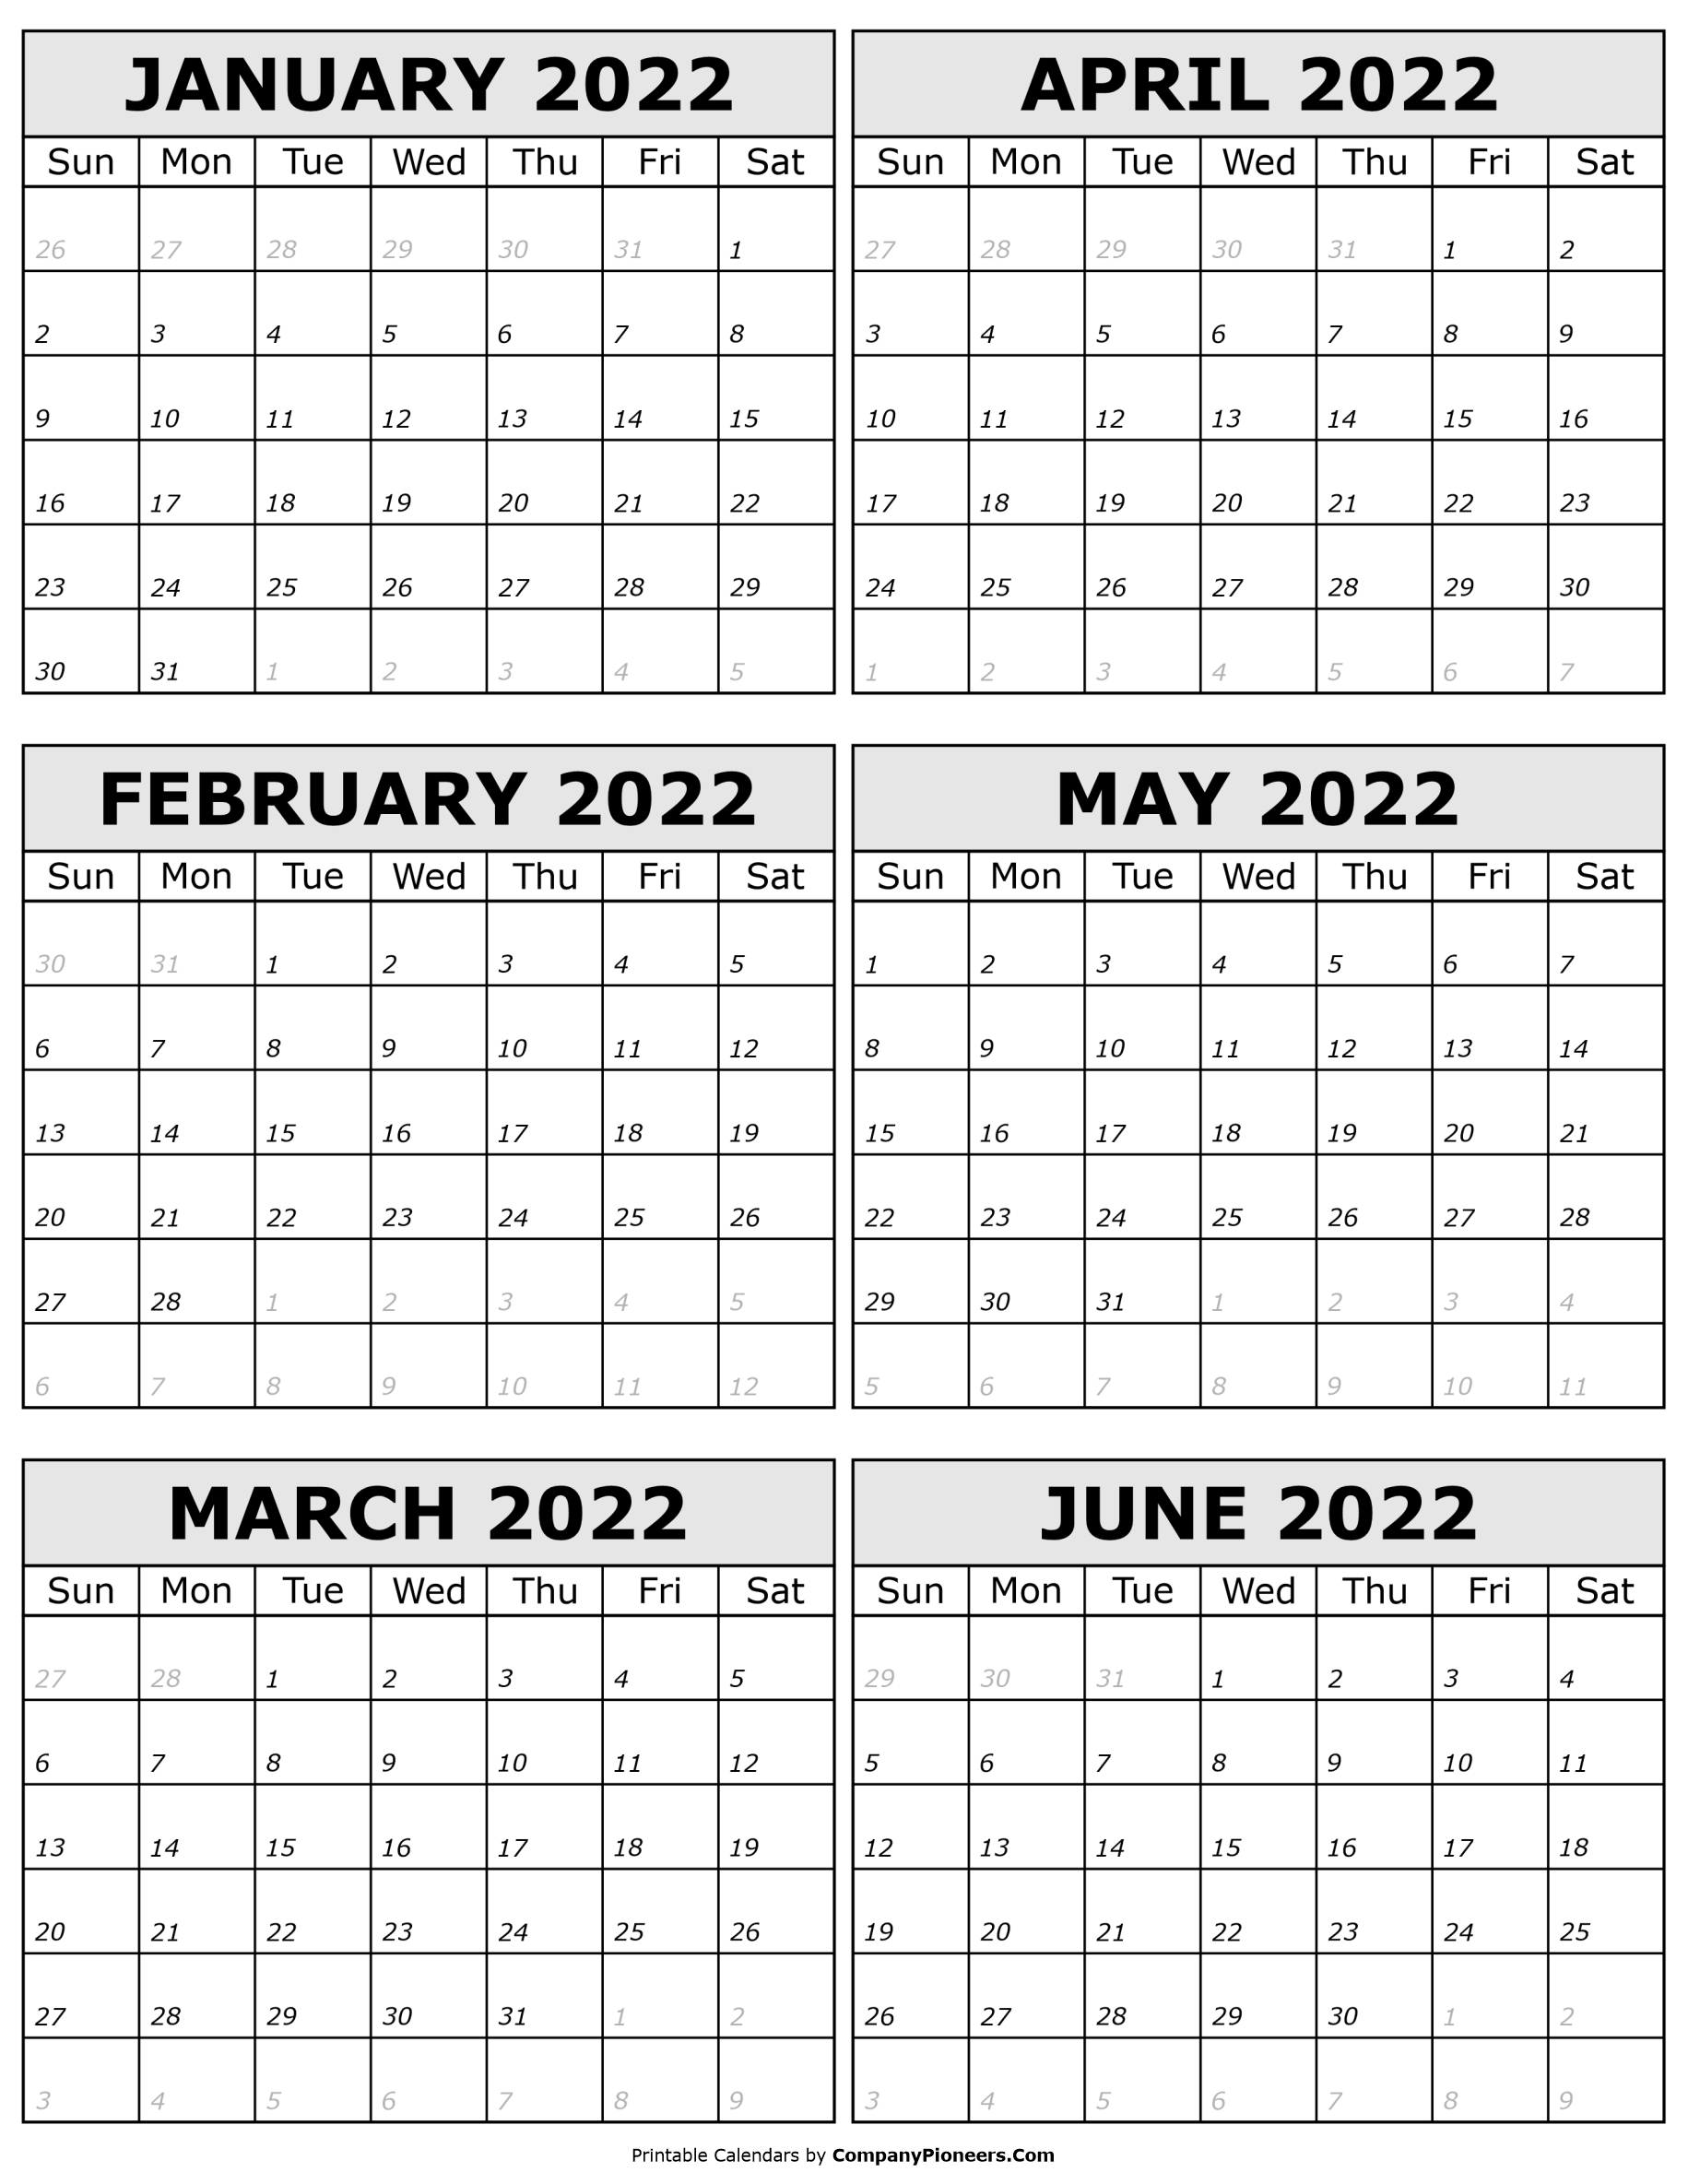 2022 January to 2022 June Calendar